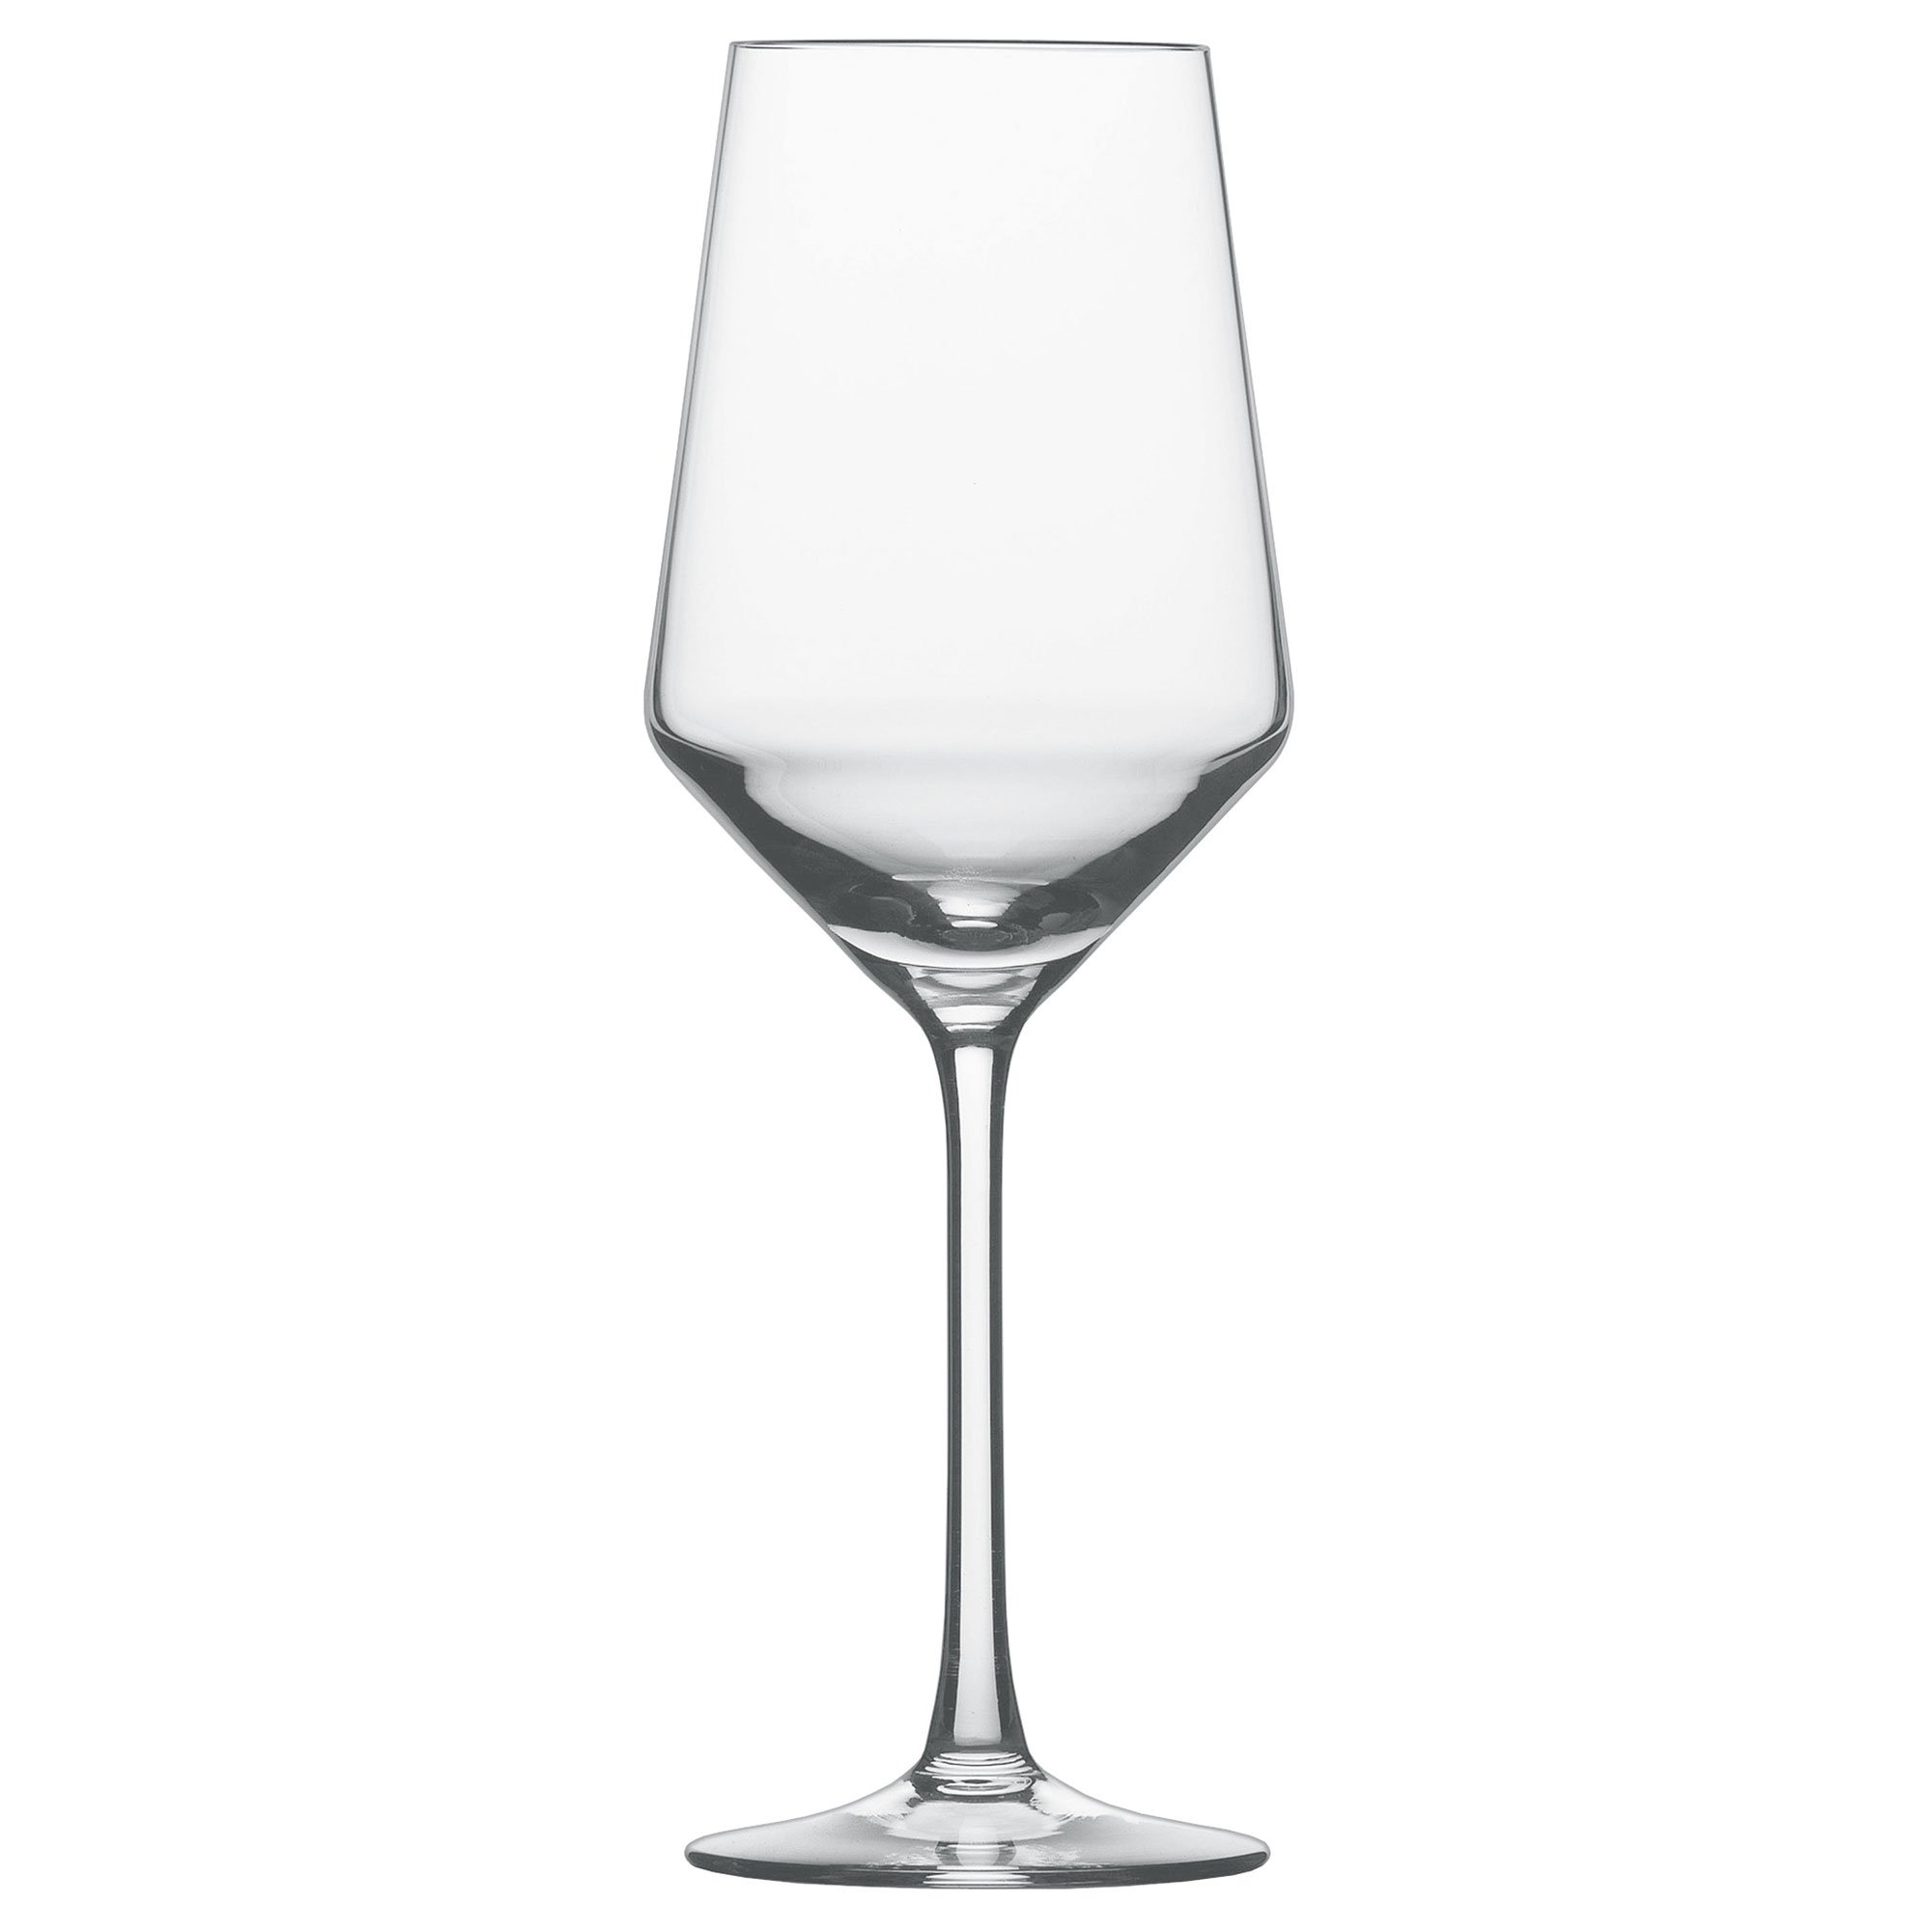 Schott Zwiesel Tritan Pure Sauvignon Blanc Glasses - Set of 6 by Schott Zwiesel (Image #1)